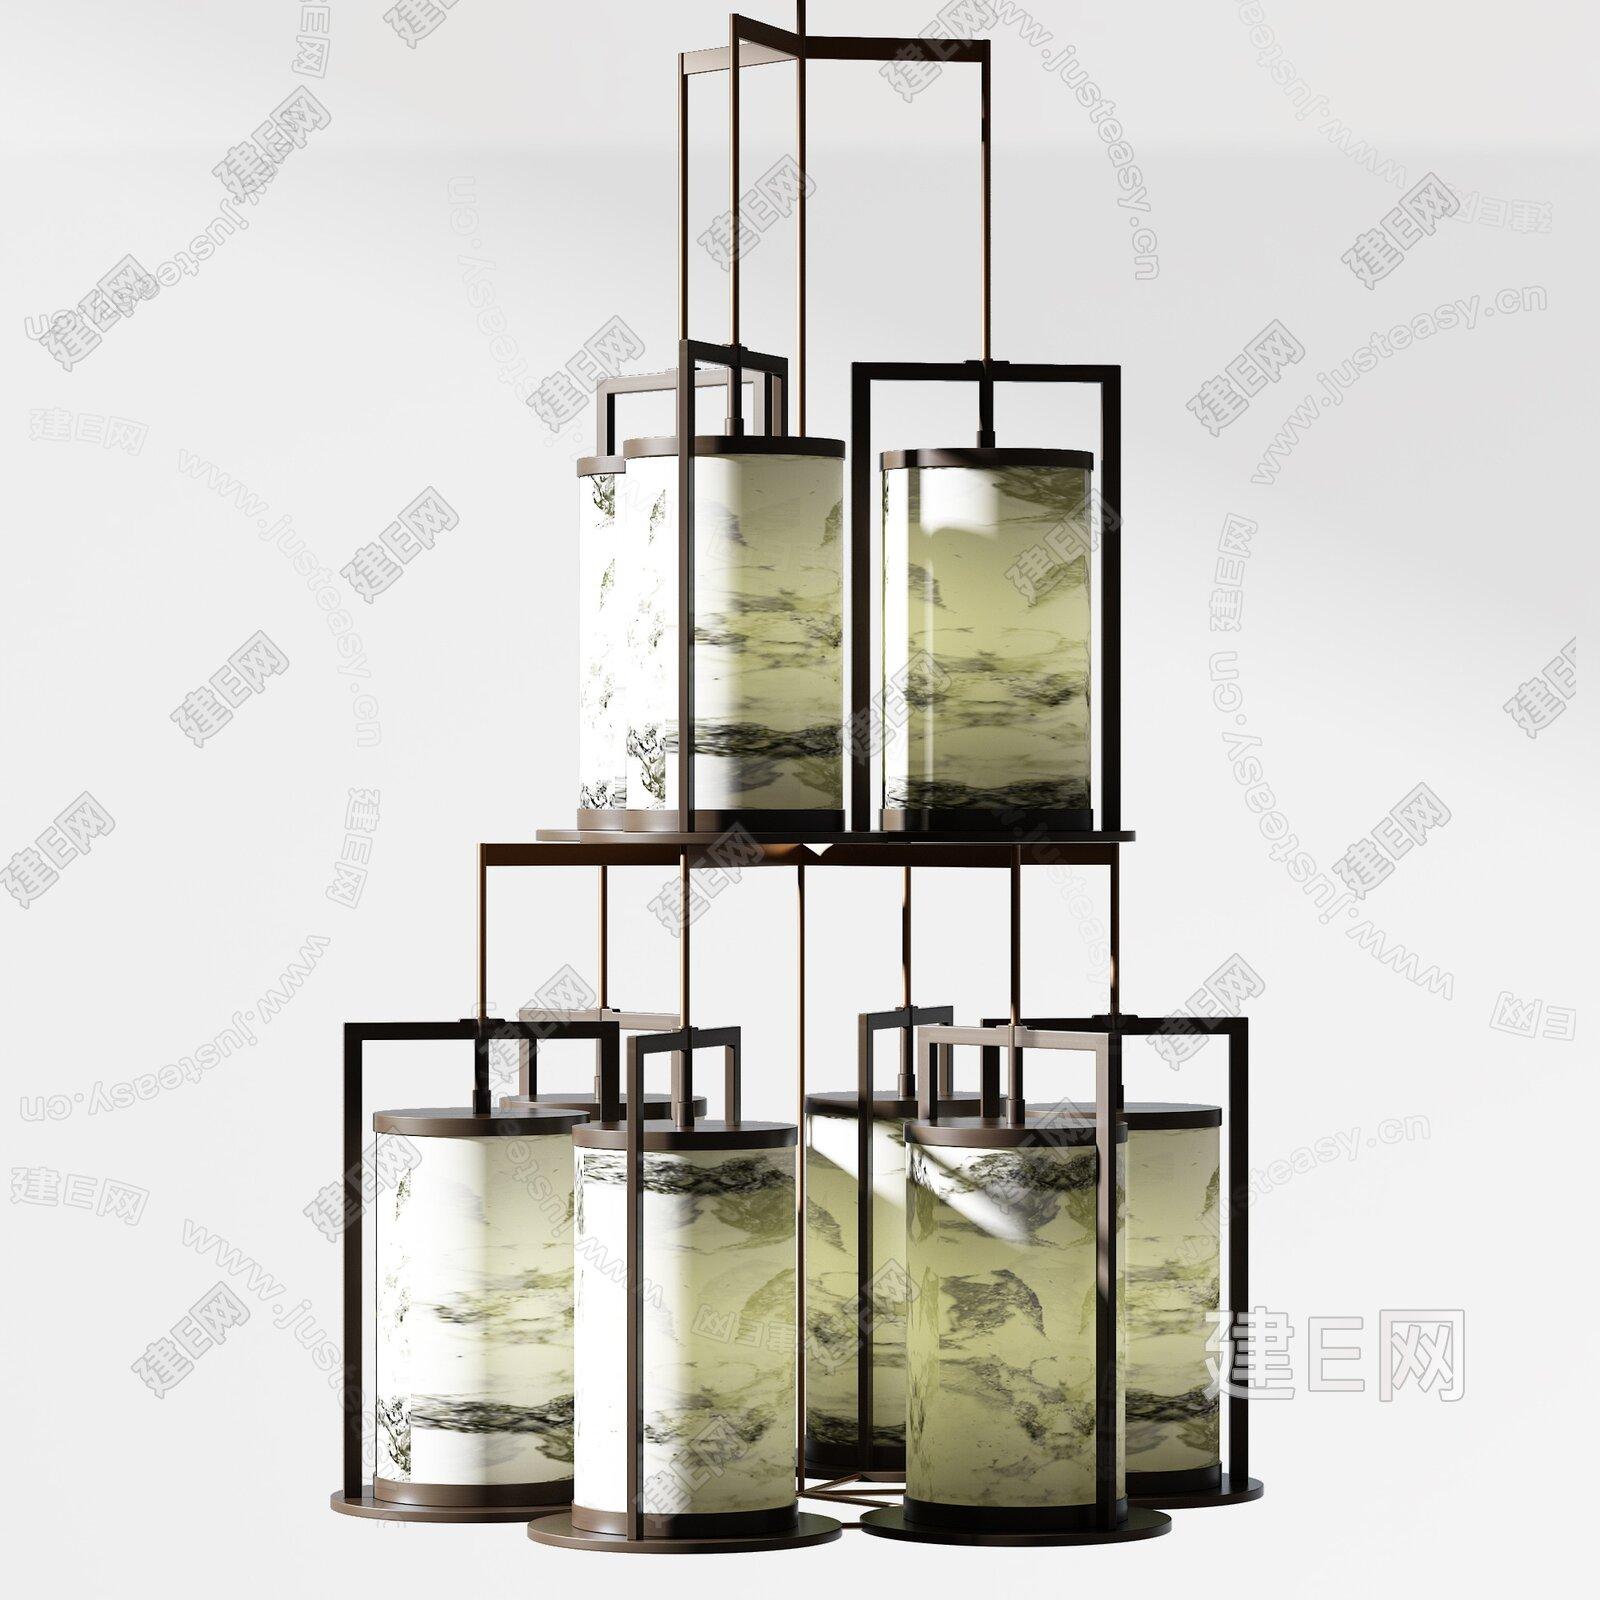 意大利 CHI WING LO 新中式吊灯3d模型